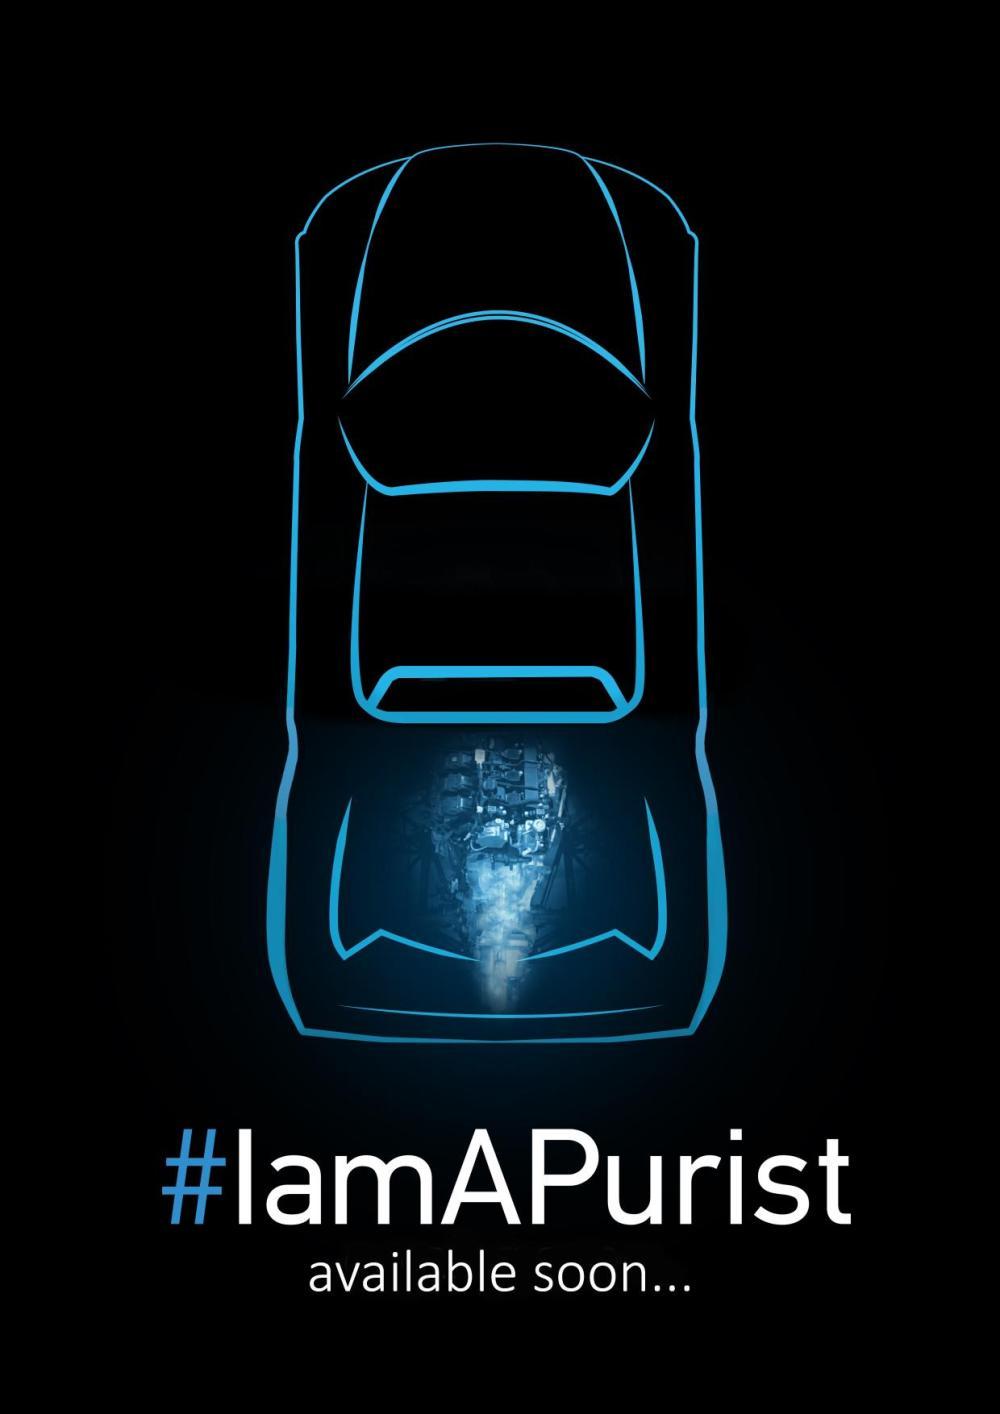 Avatar Debut at Performance Car Show - Emerging Magazine-Automotive News